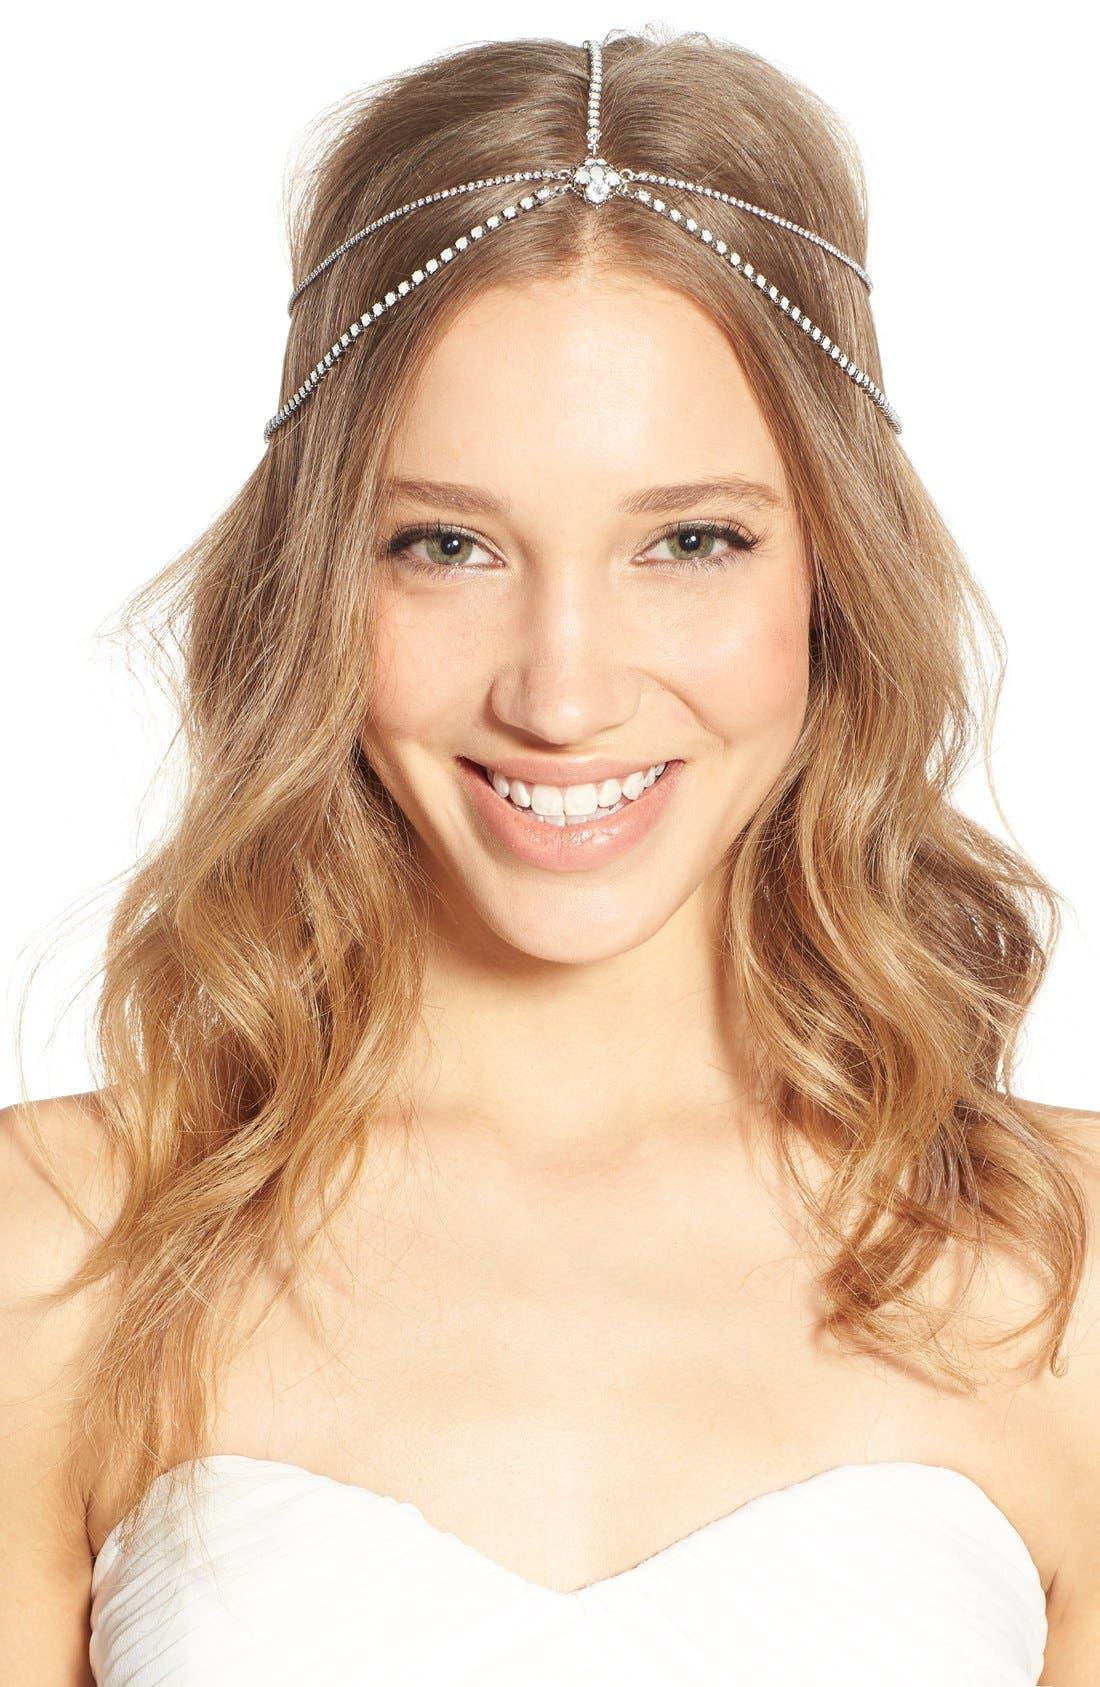 'Lindsay' Embellished Hair Chain,                         Main,                         color,